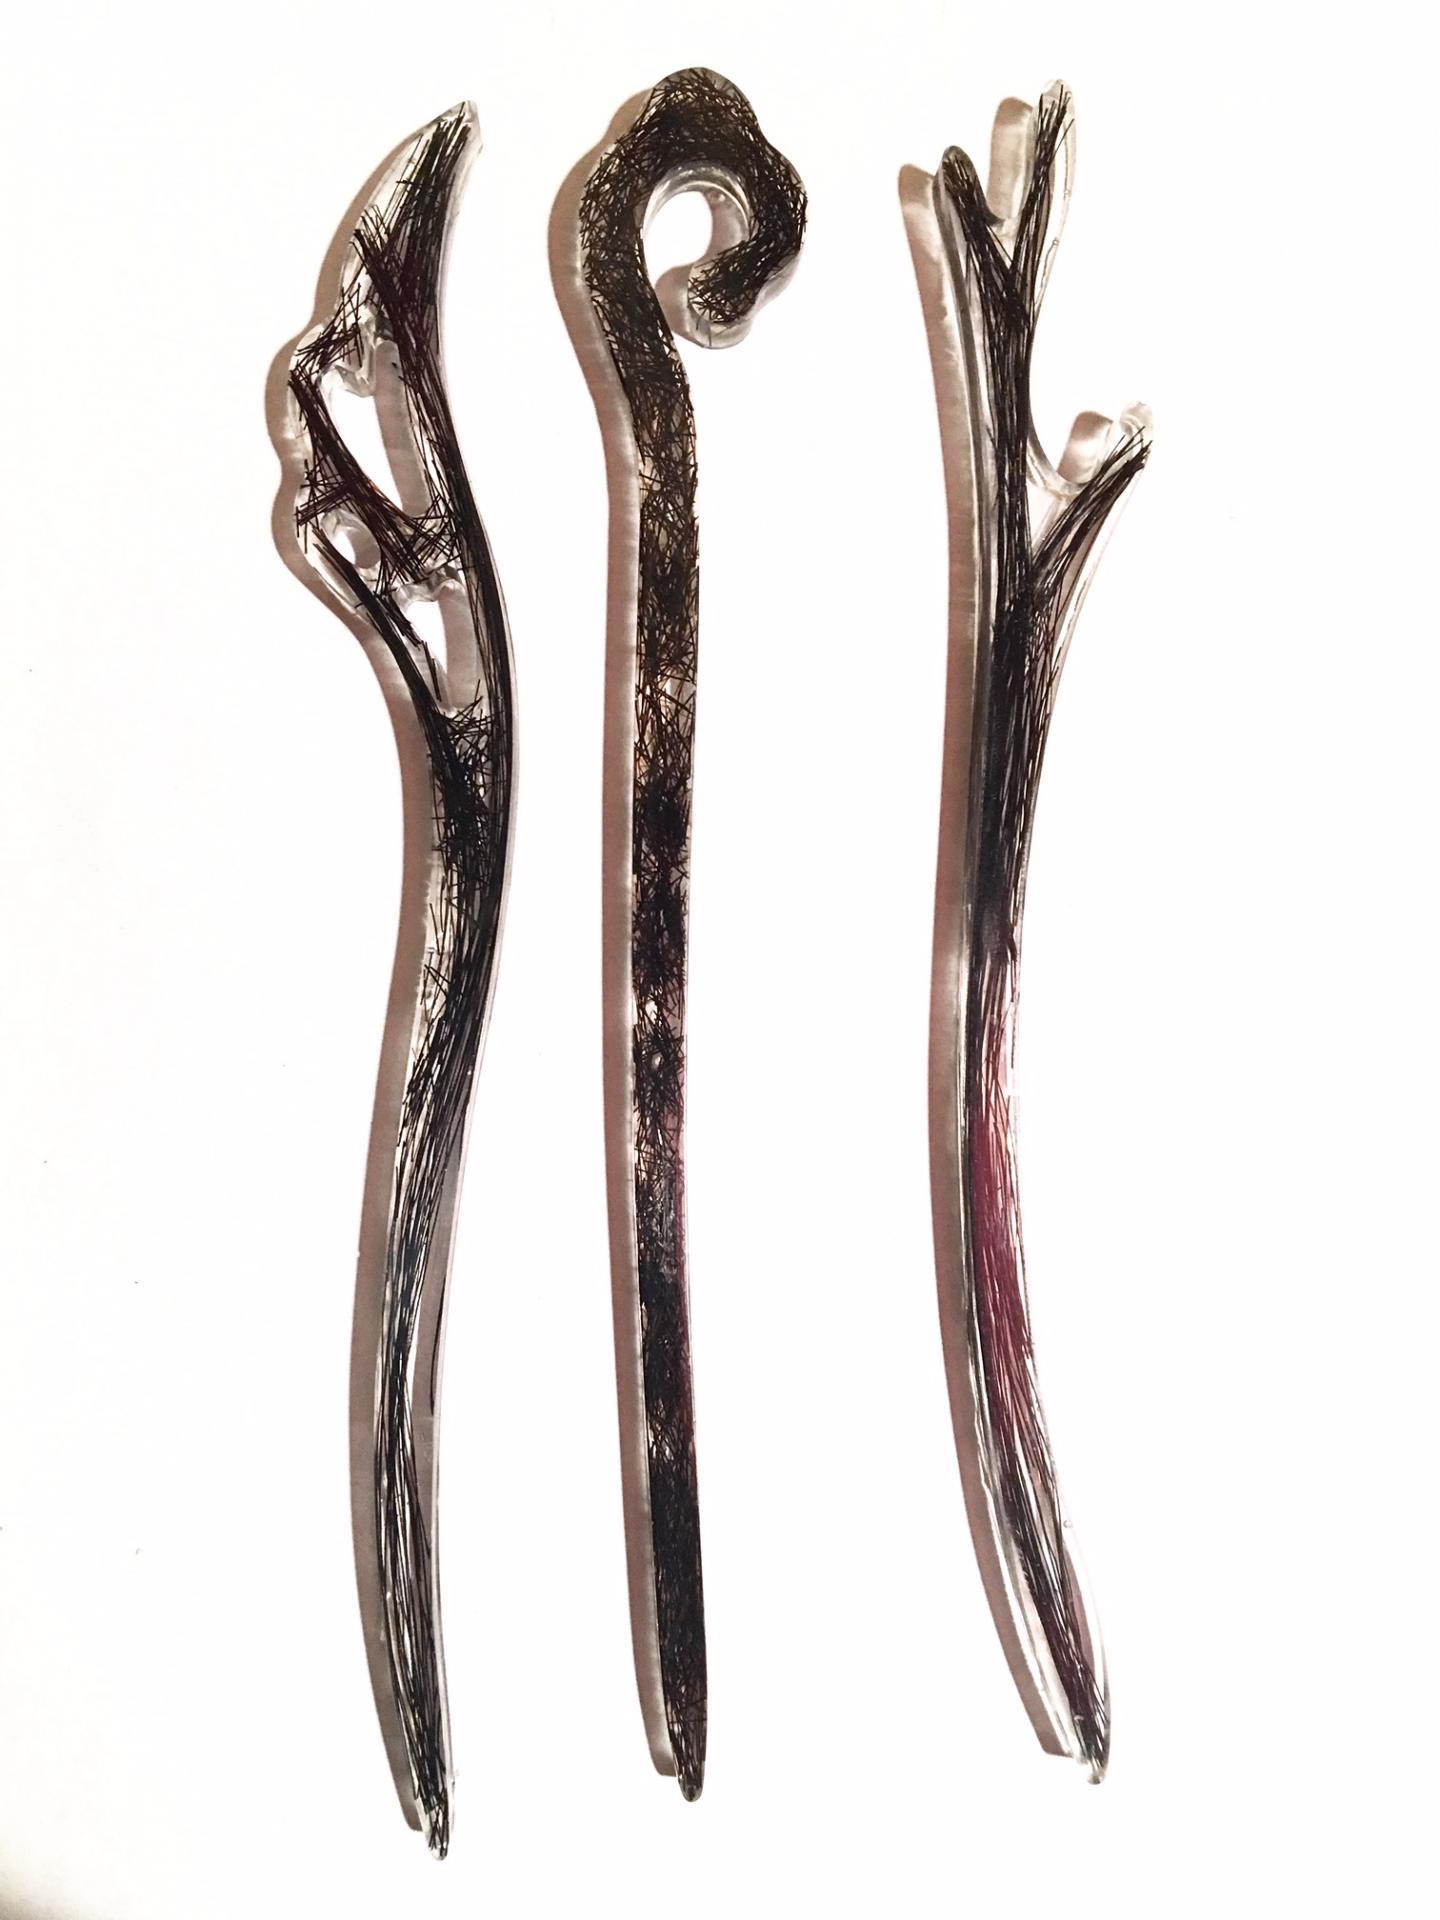 Creation crins cheval bijoux pique cheveux immortel forme originale femme resine solide